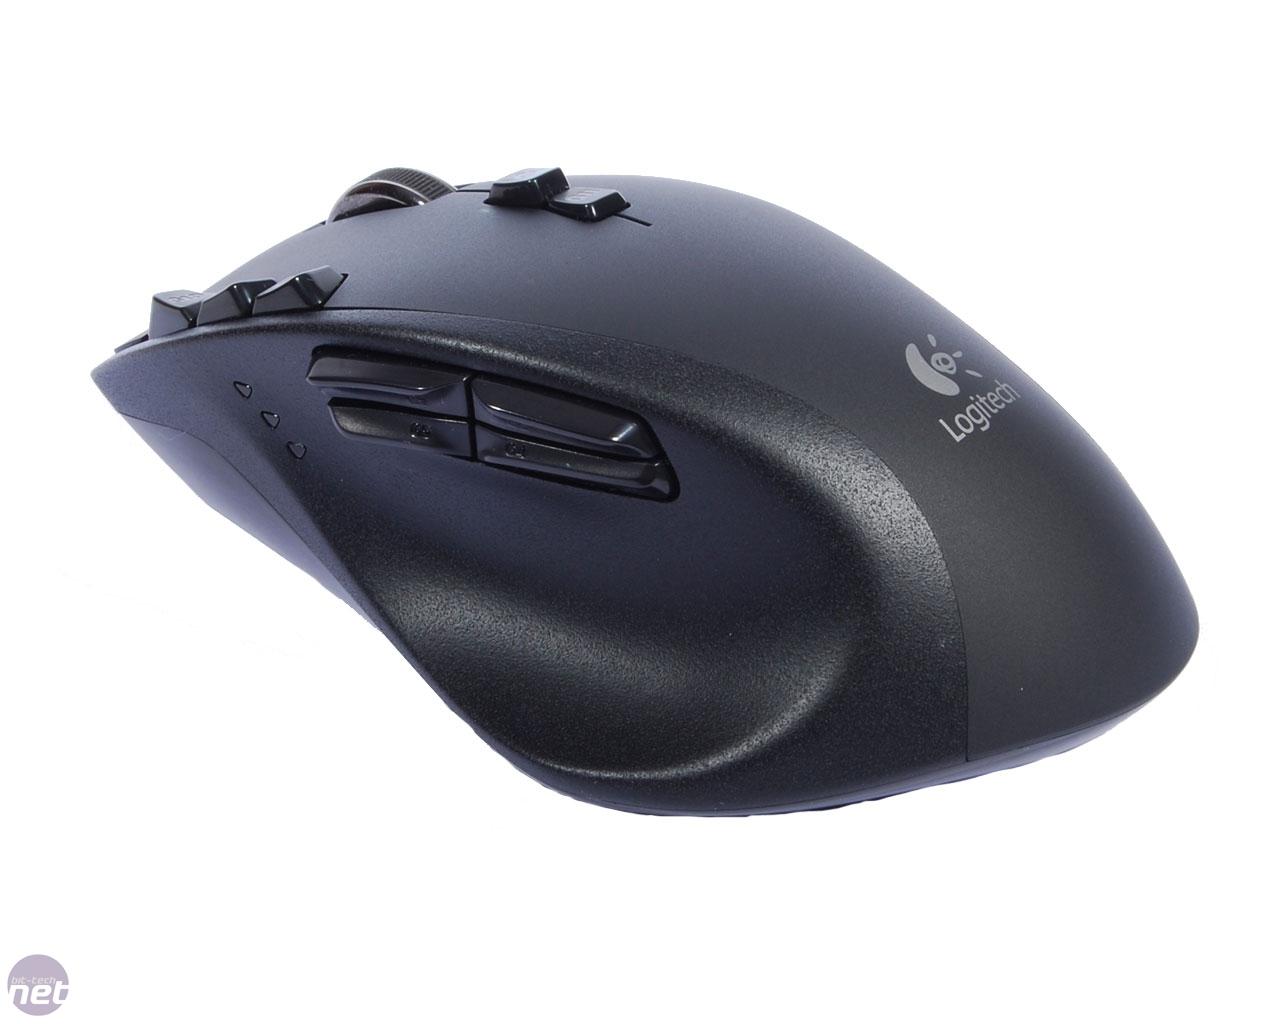 hid-compliant-mouse-driver